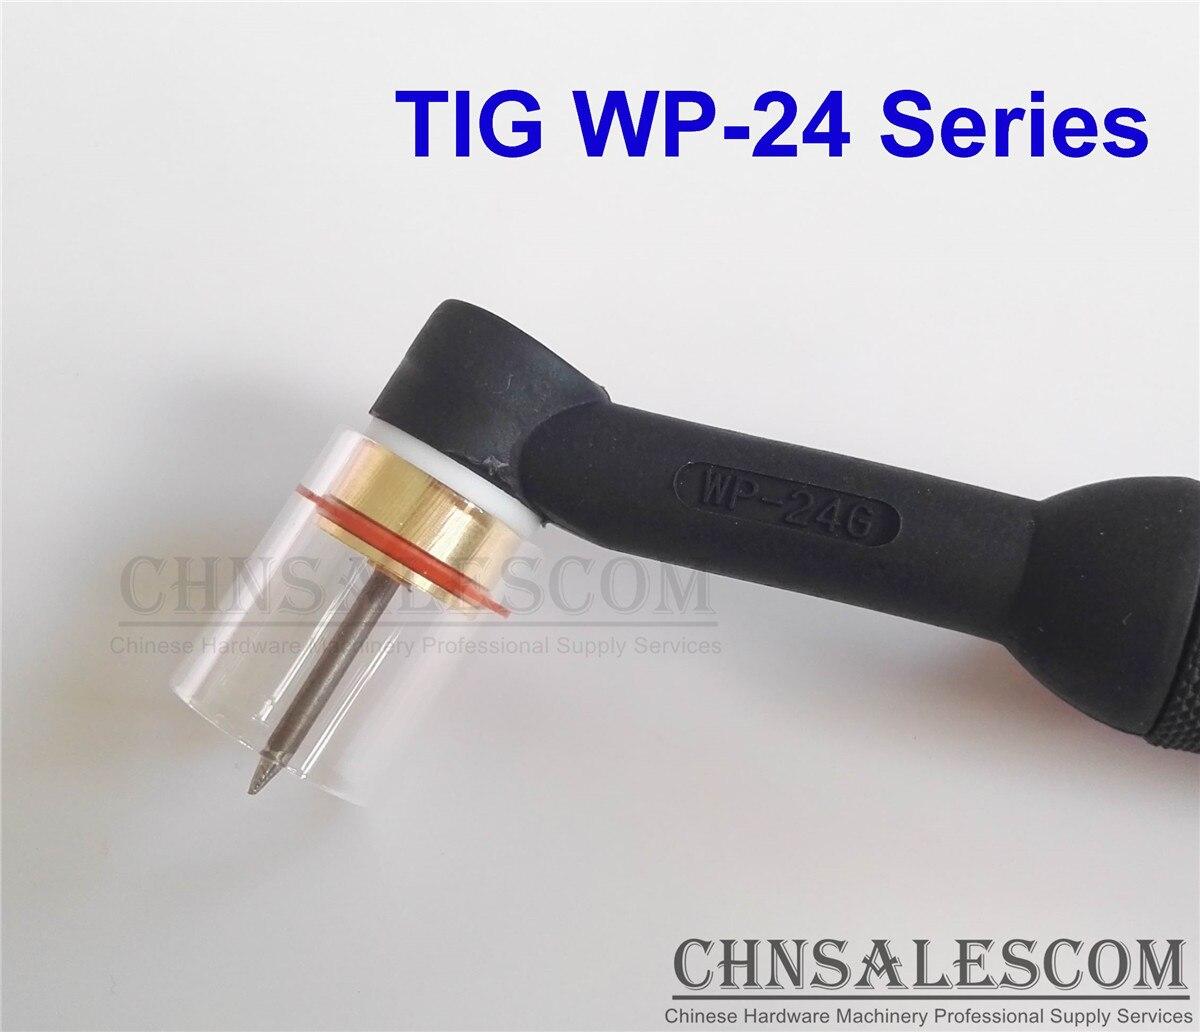 "CHNSALESCOM 7 Uds TIG soldadura 10 #12 # Pyrex Kit de copa de vidrio para WP-24 serie. 040 ""1/16"" 3/32"""